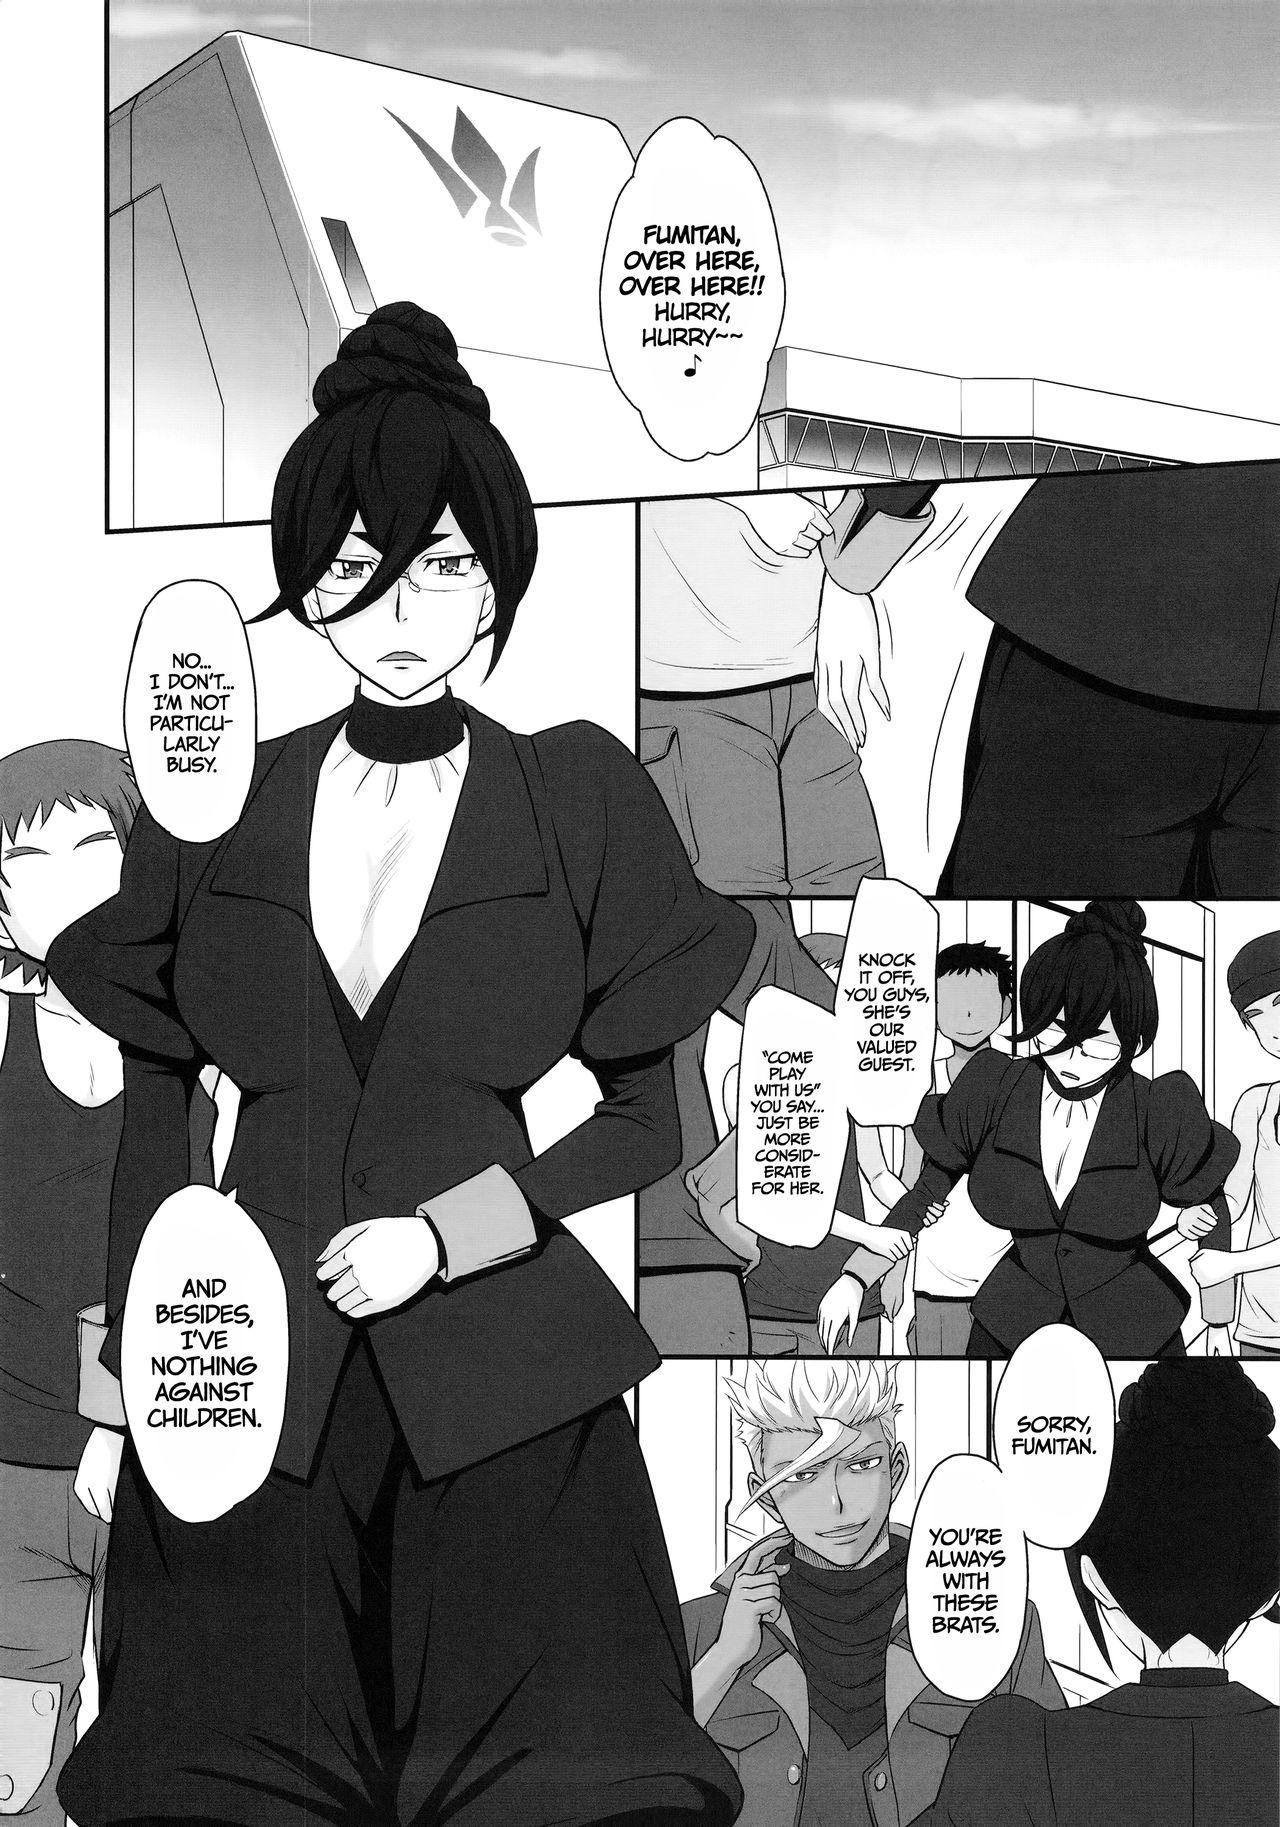 Shota Gui Maid no Gosan to Daishou   Shota Eating Maid's Miscalculation and Compensation 2